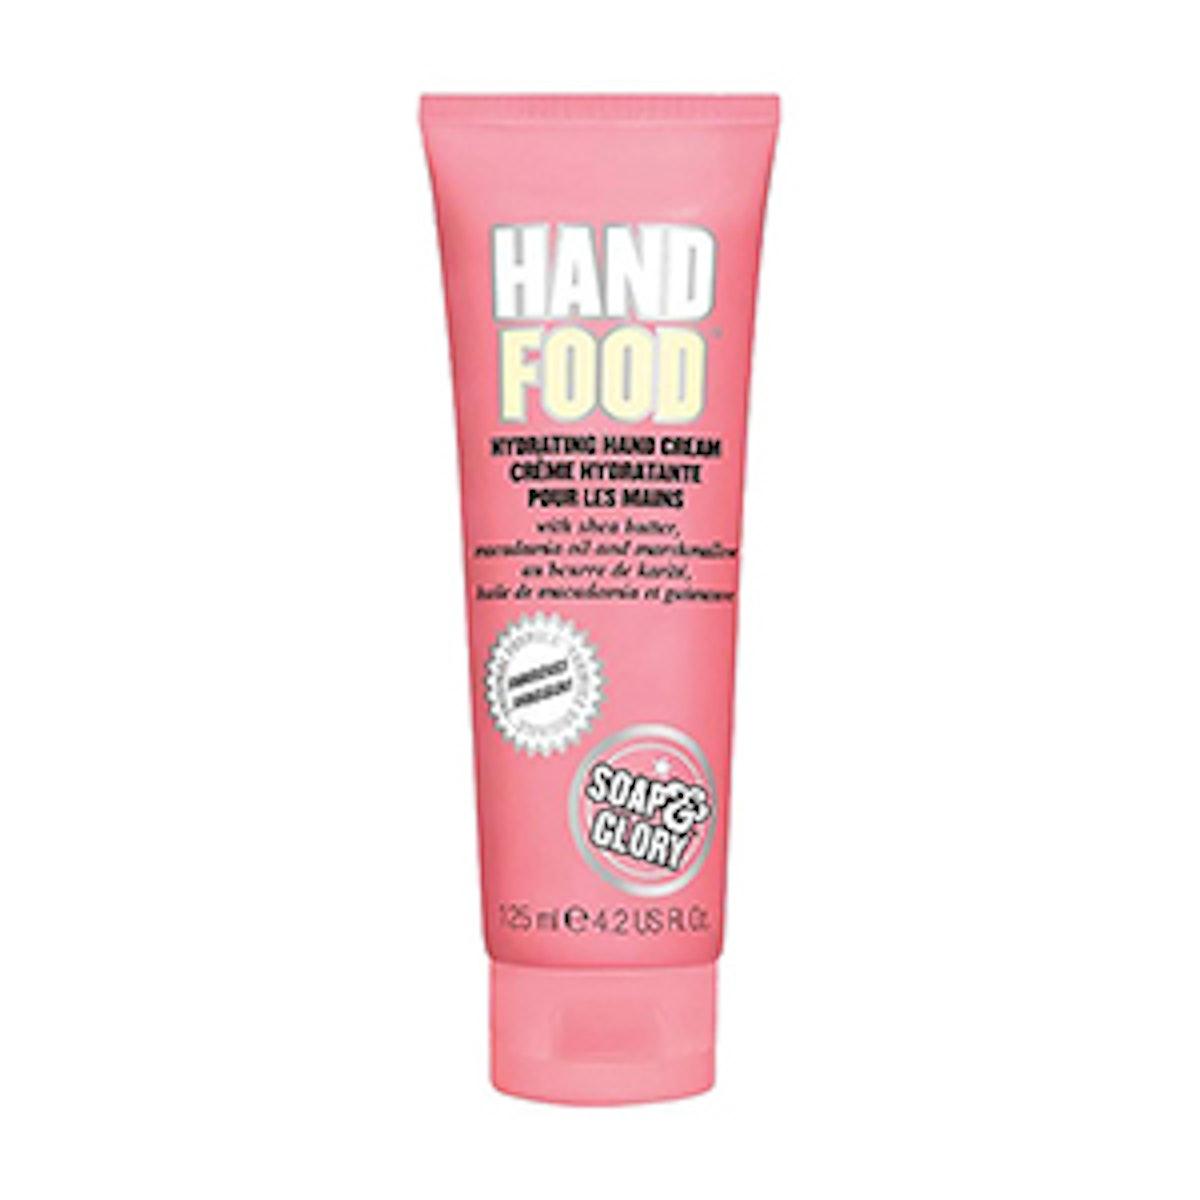 Hand Food Hand Cream